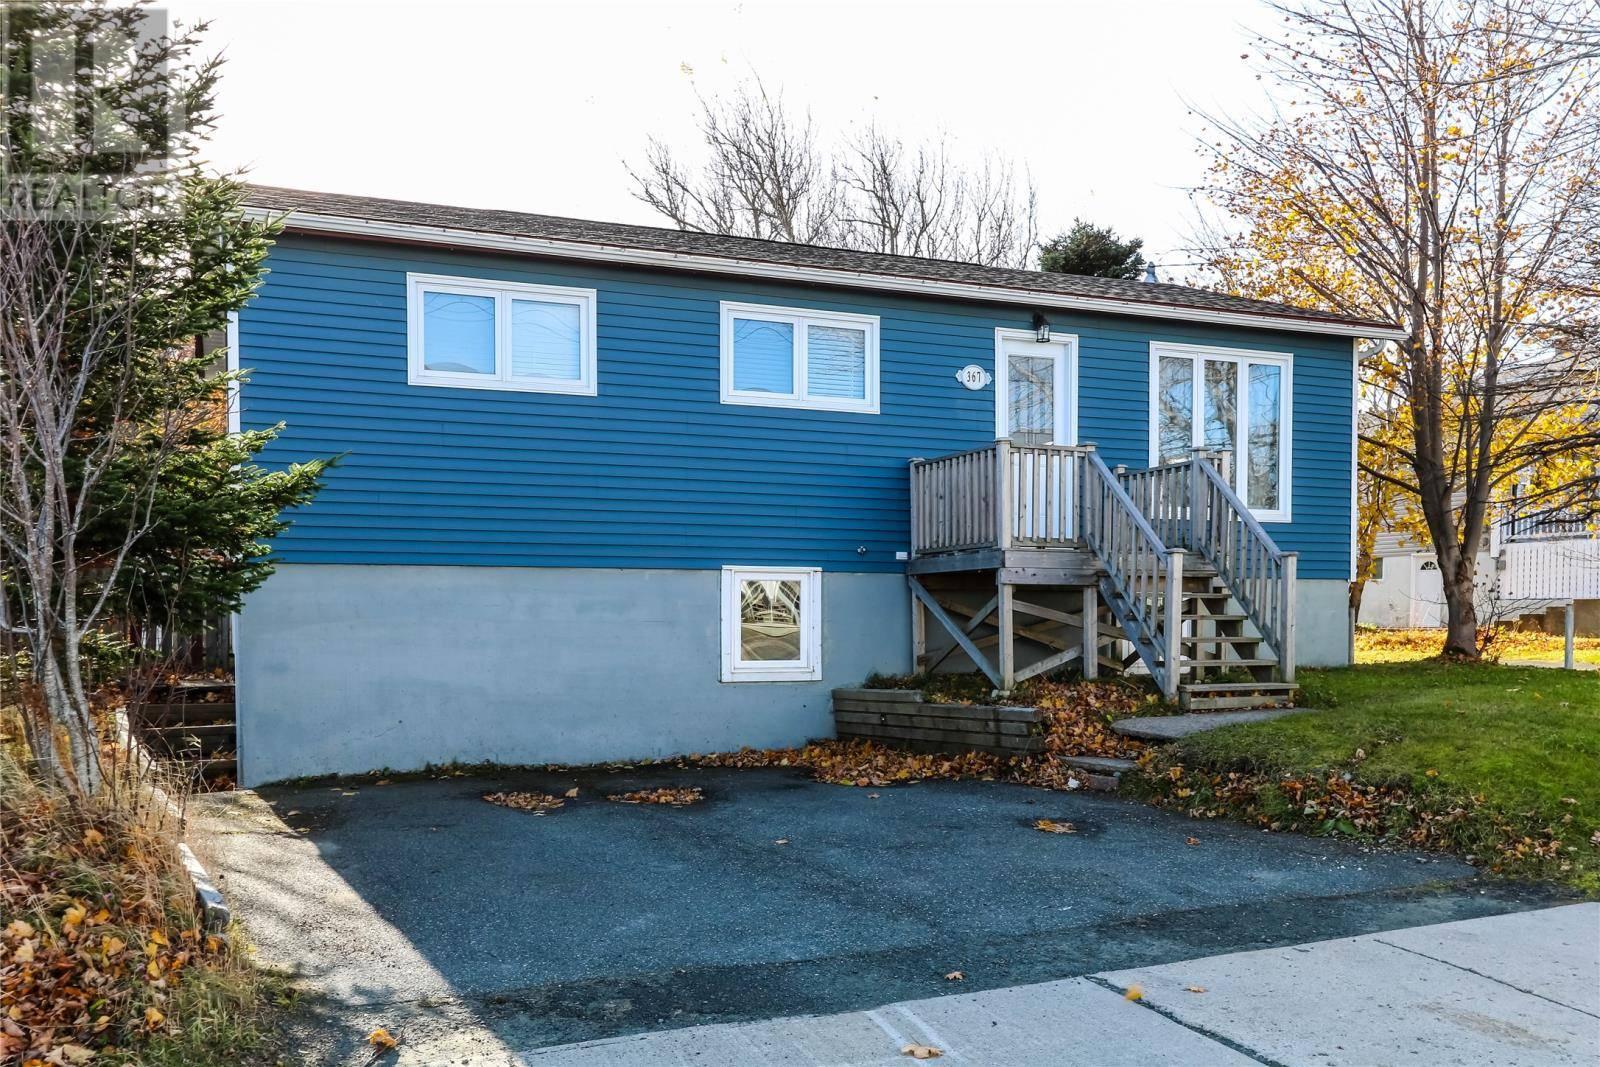 House for sale at 367 Blackmarsh Rd St. John's Newfoundland - MLS: 1206985